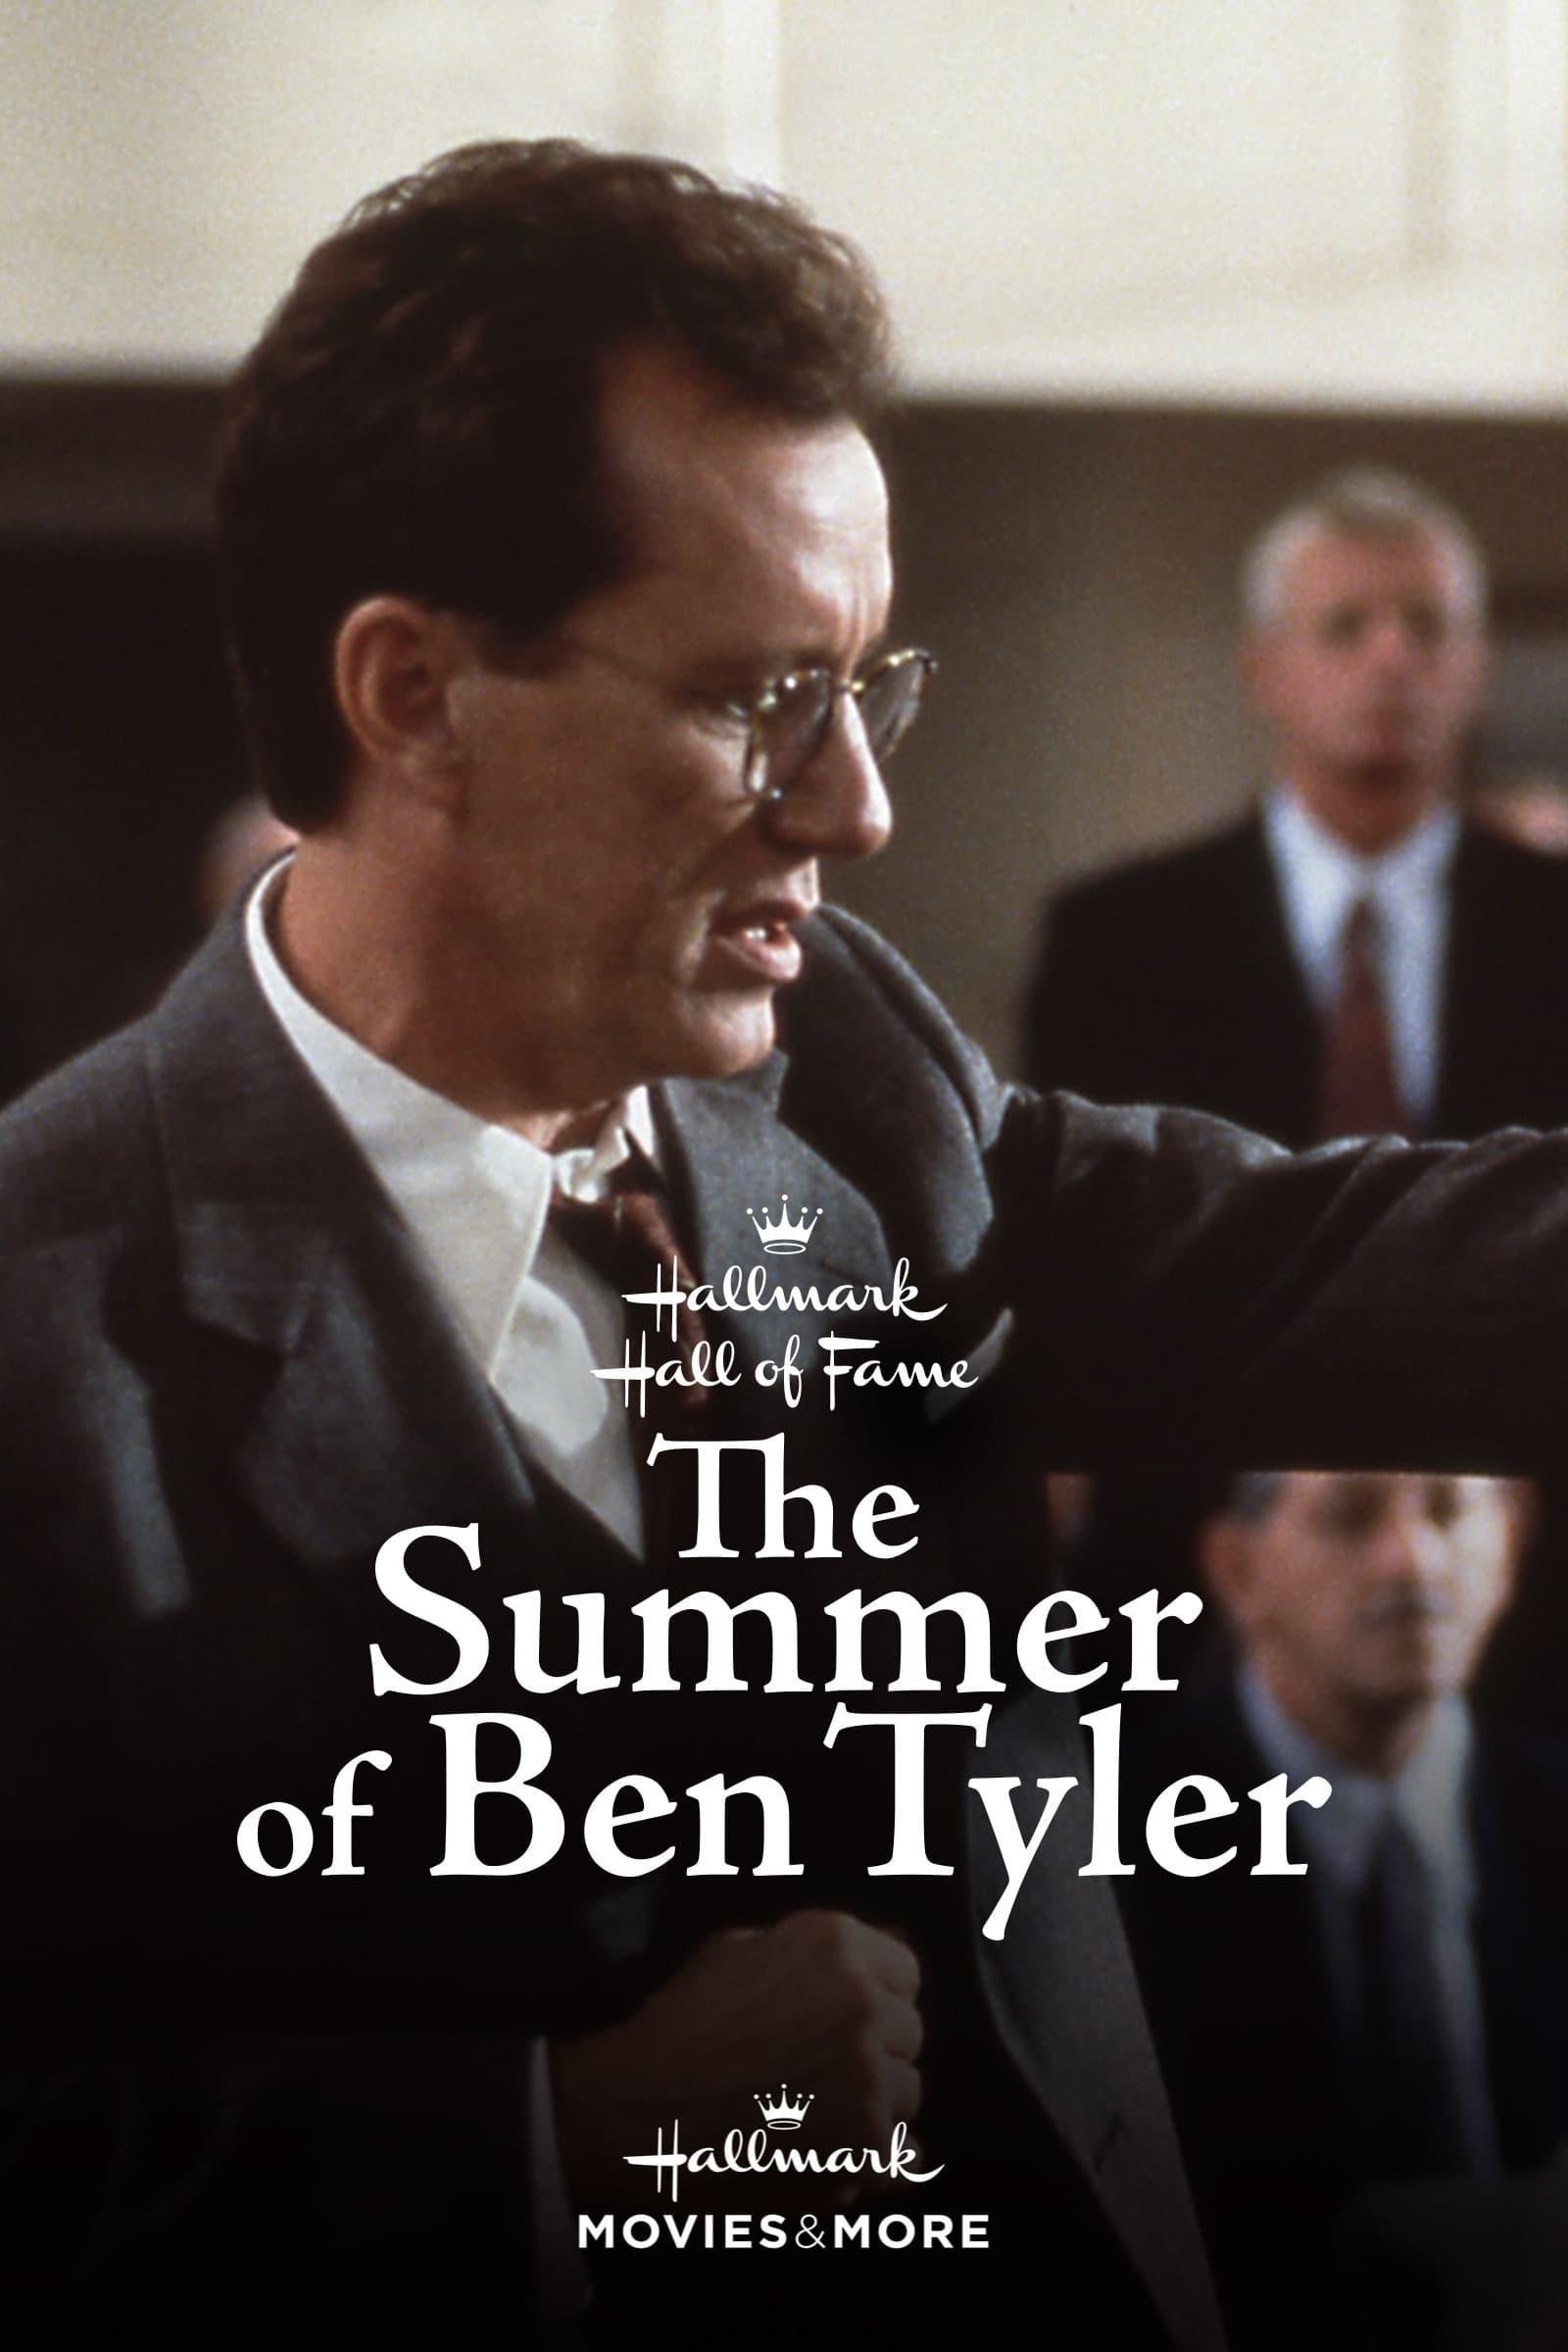 The Summer of Ben Tyler